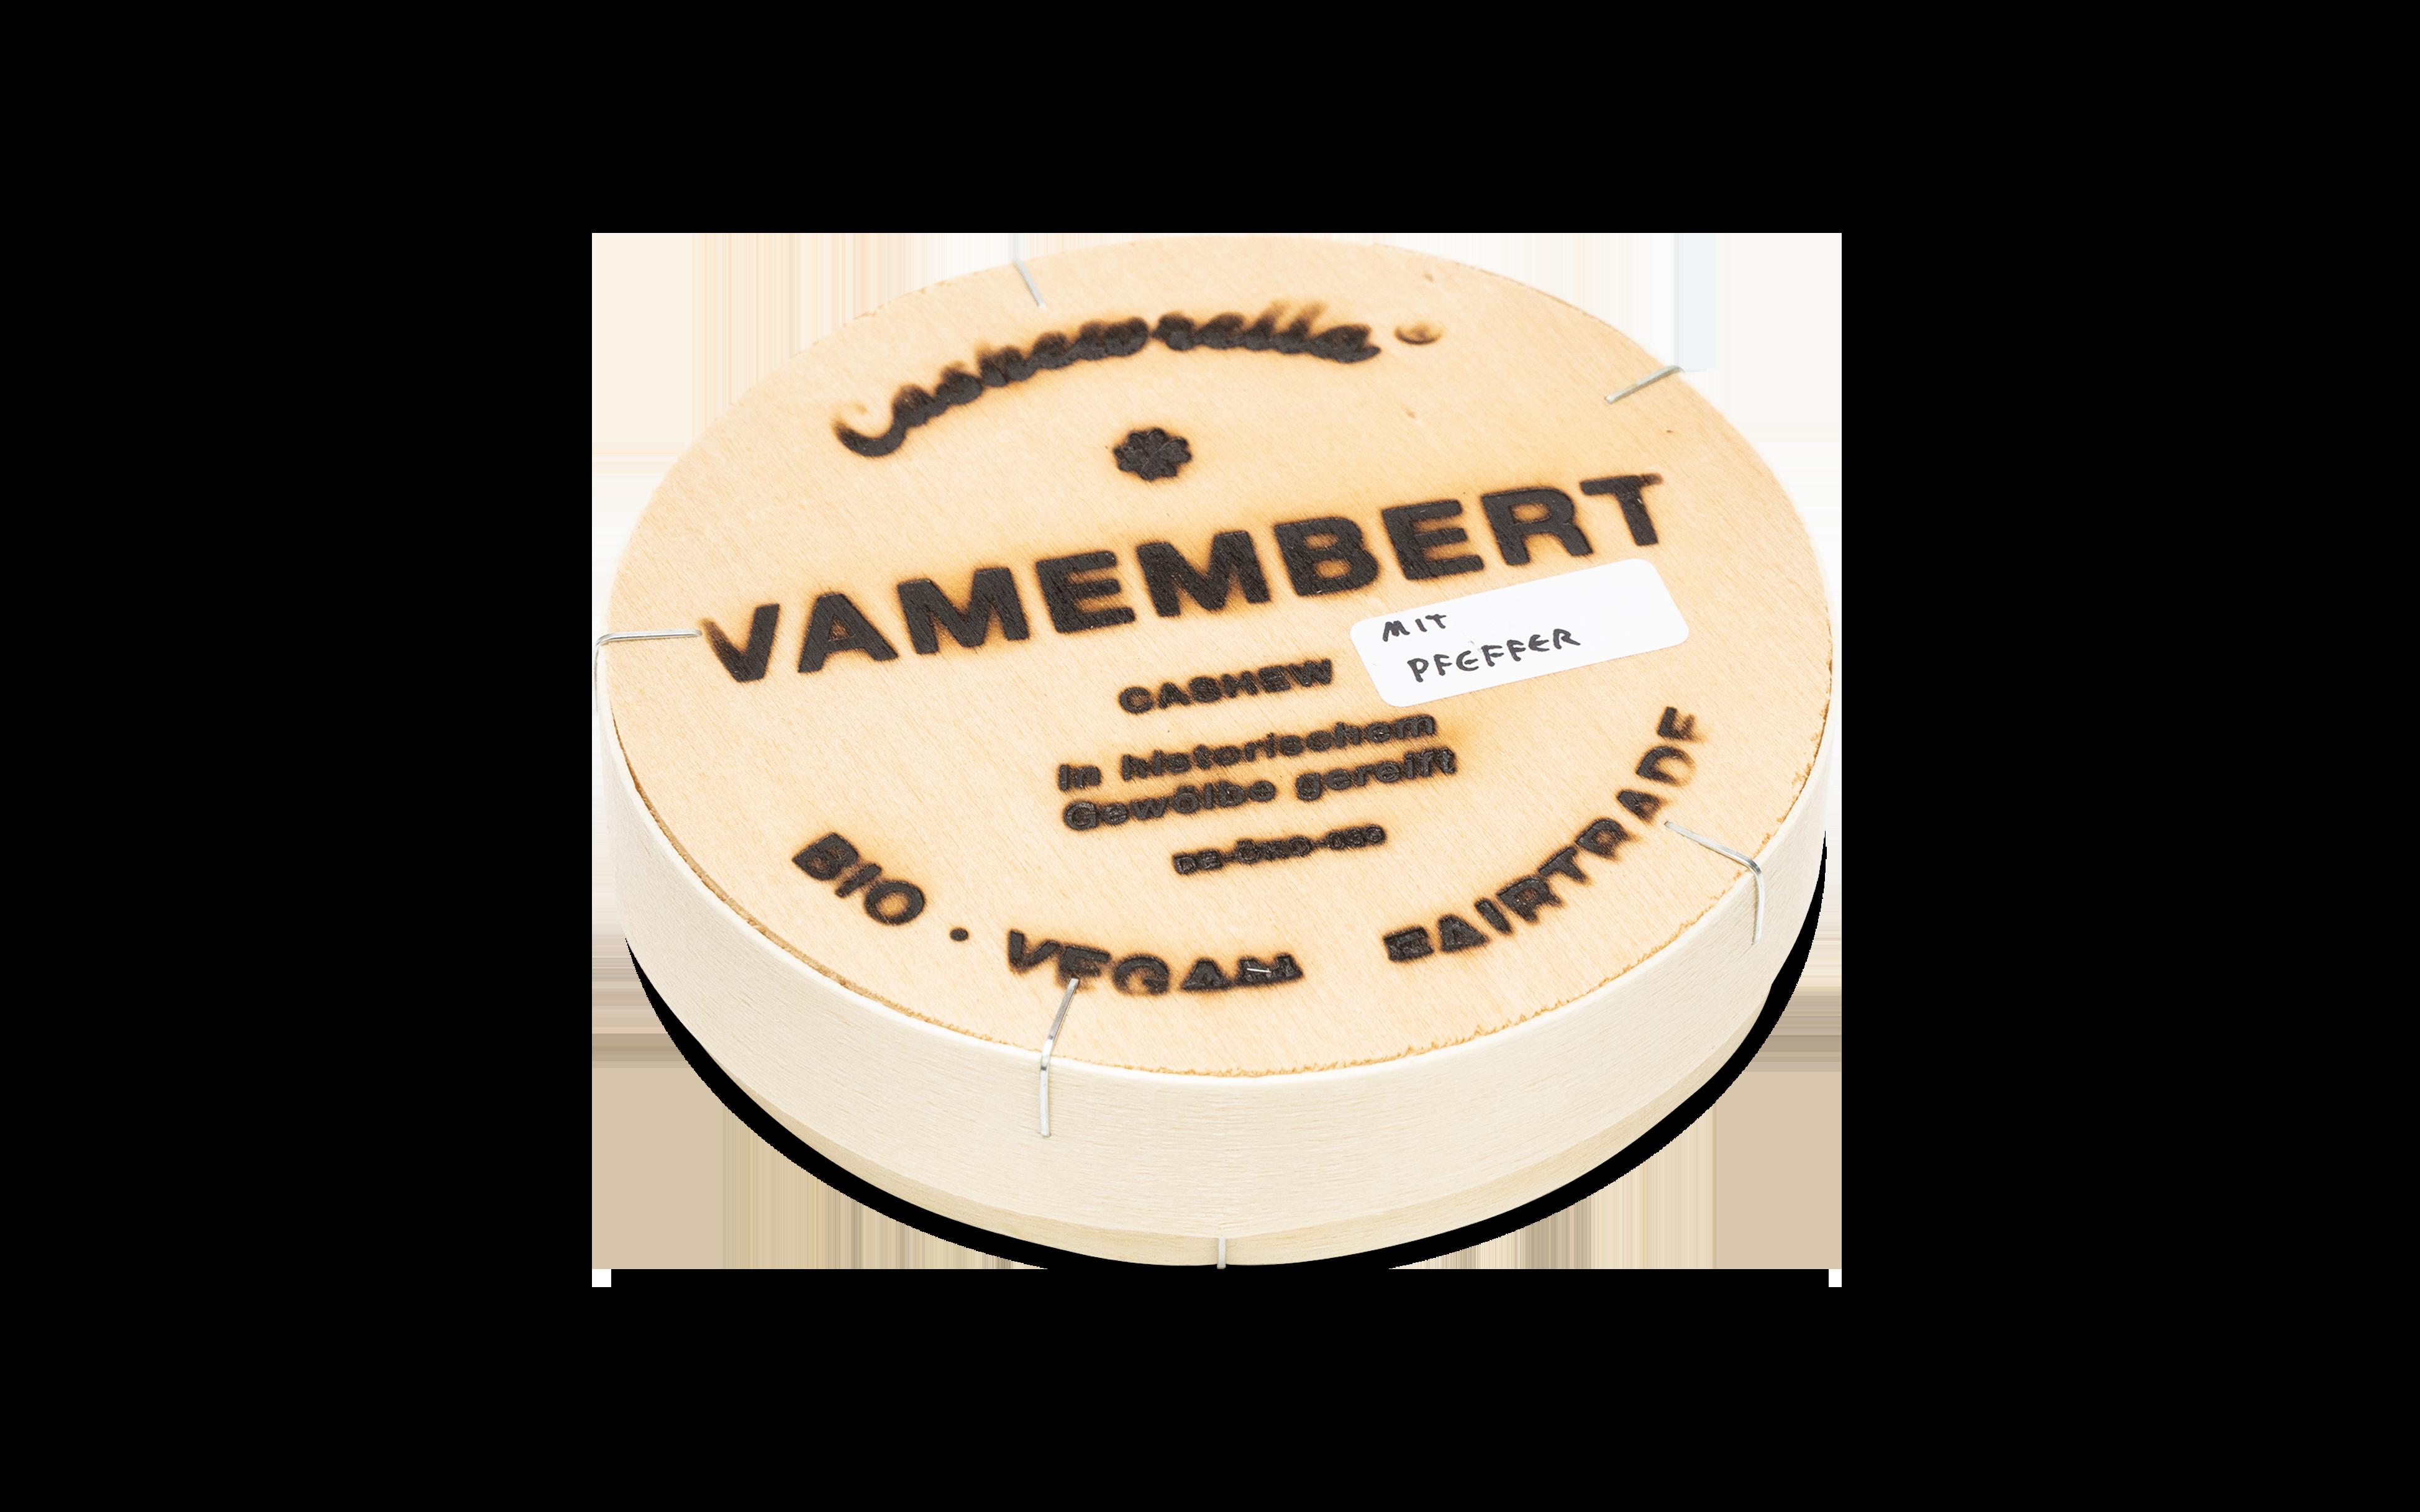 Vamembert mit Pfeffer [BIO]+[VEGAN]